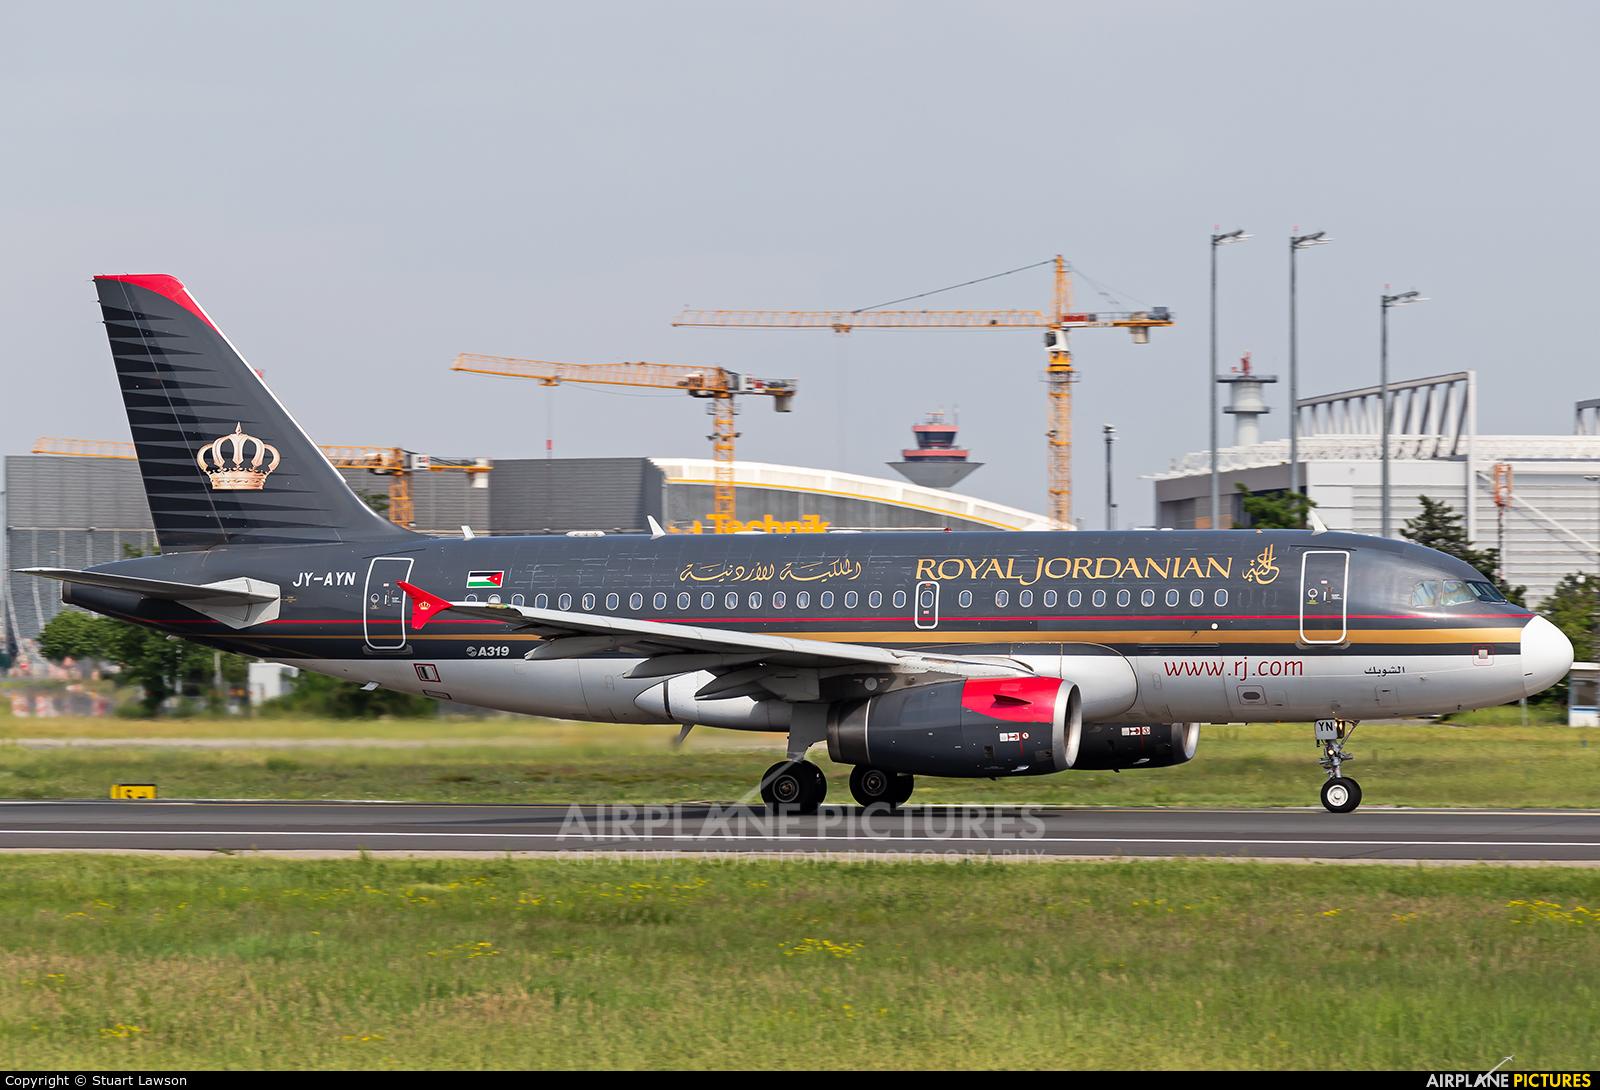 Royal Jordanian JY-AYN aircraft at Frankfurt